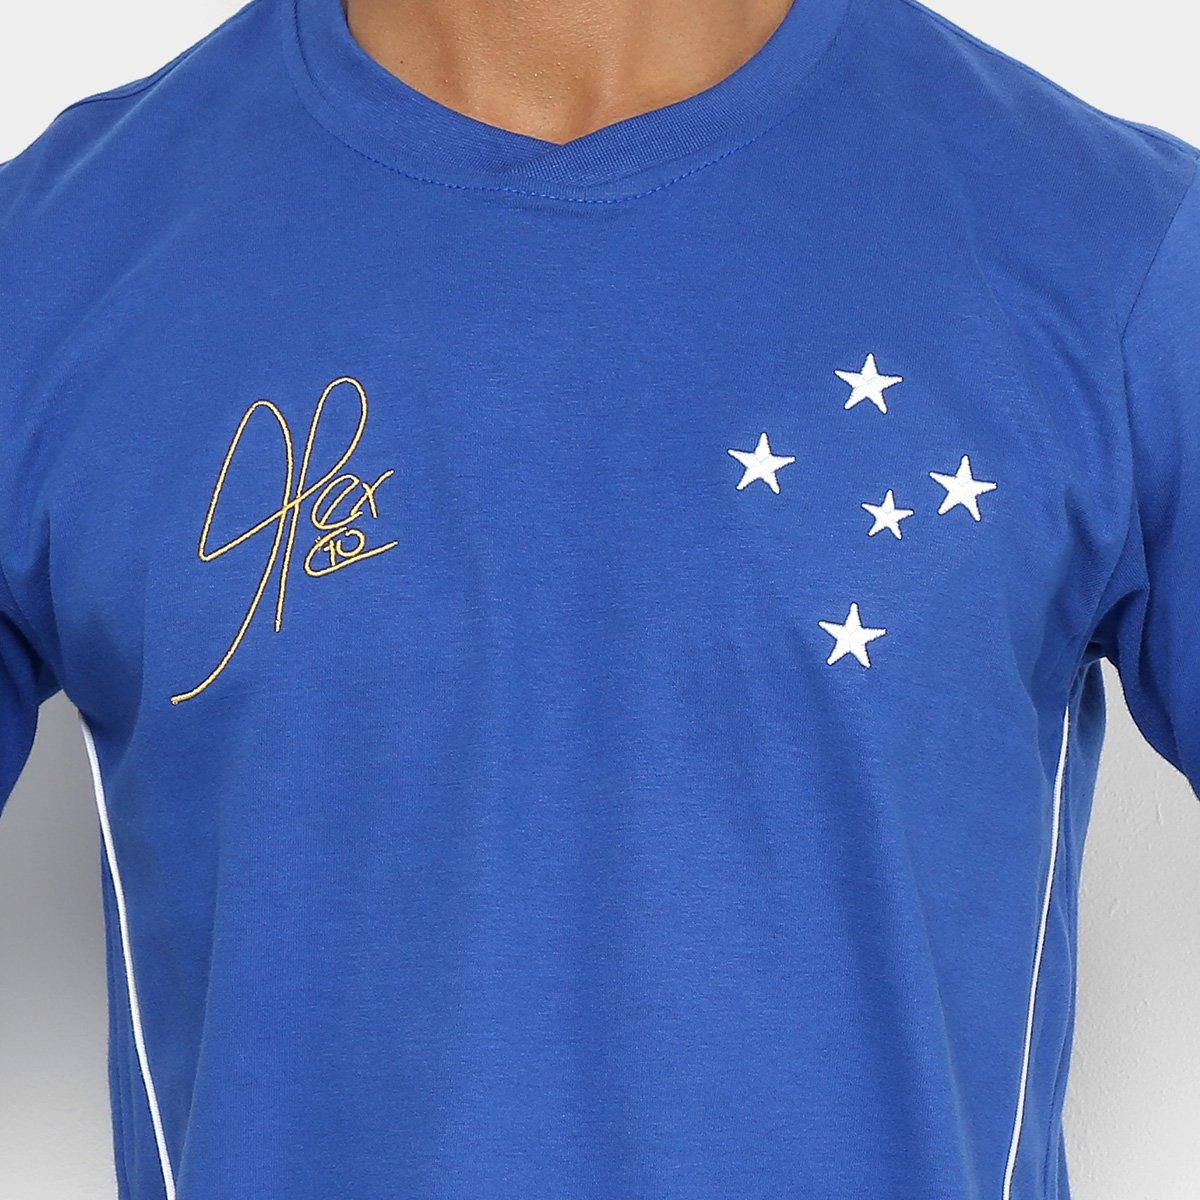 Camiseta Cruzeiro Retrô Mania 2003 Copa do Brasil Masculina - Azul ... d3d40c67c04b9